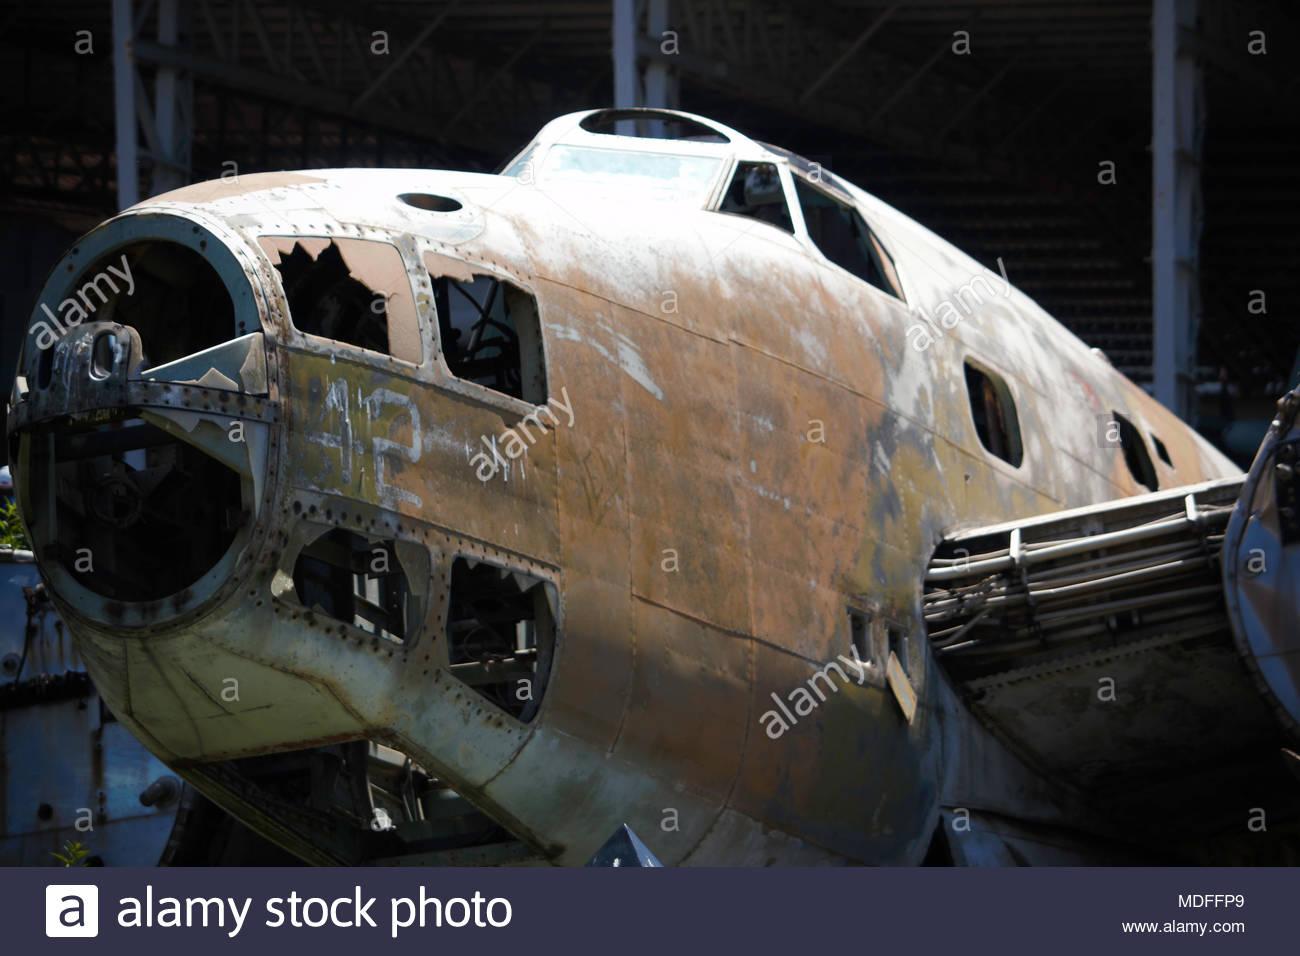 Derelict Hudson Bomber Aircraft Airframe Cabin Exterior - Stock Image